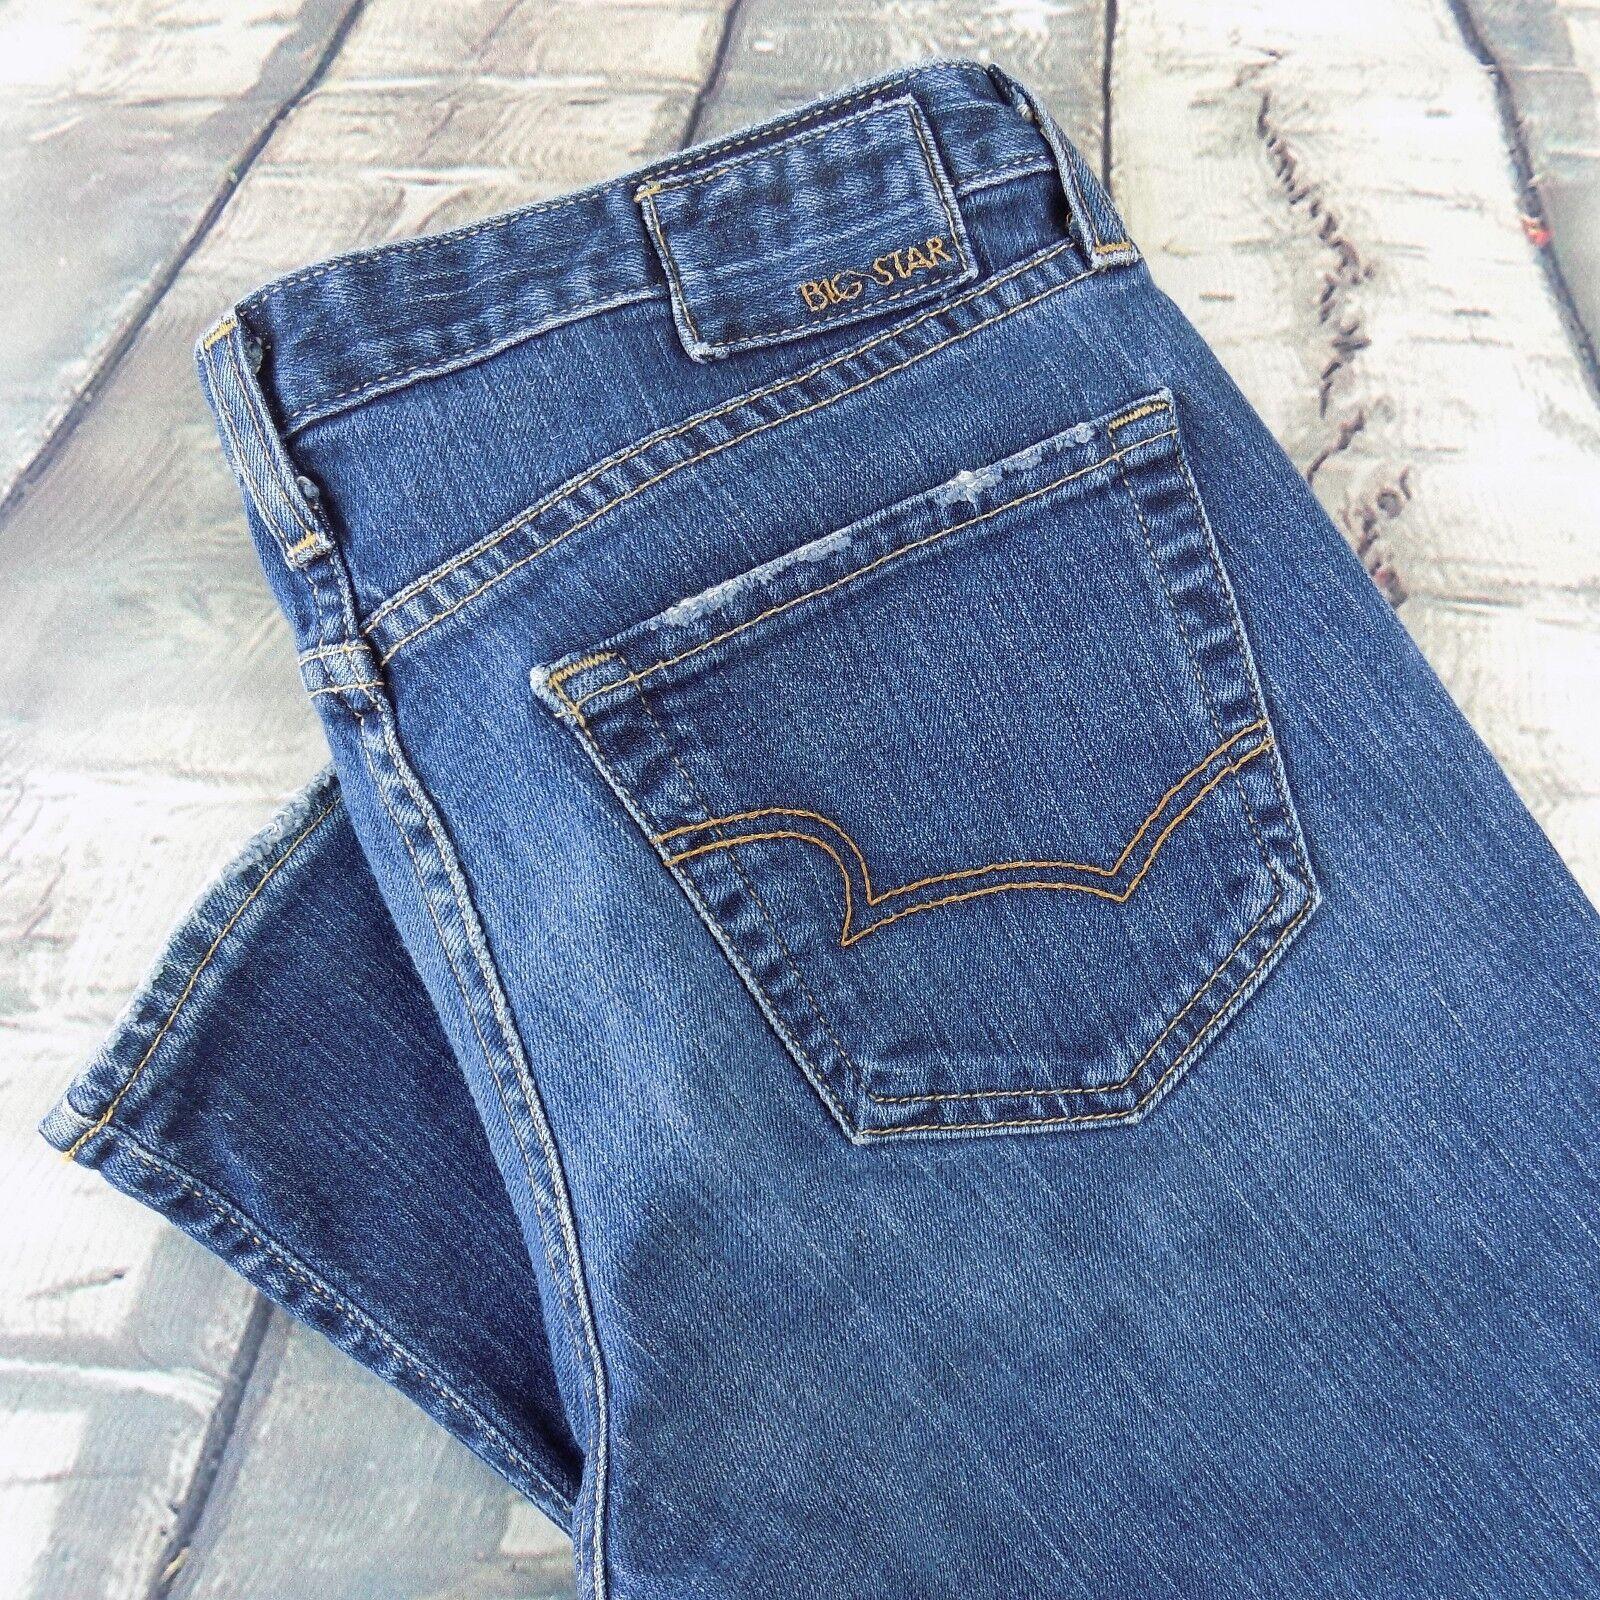 Big Star Jeans Size 29 R Women's Mia Bootcut Sz 29 33